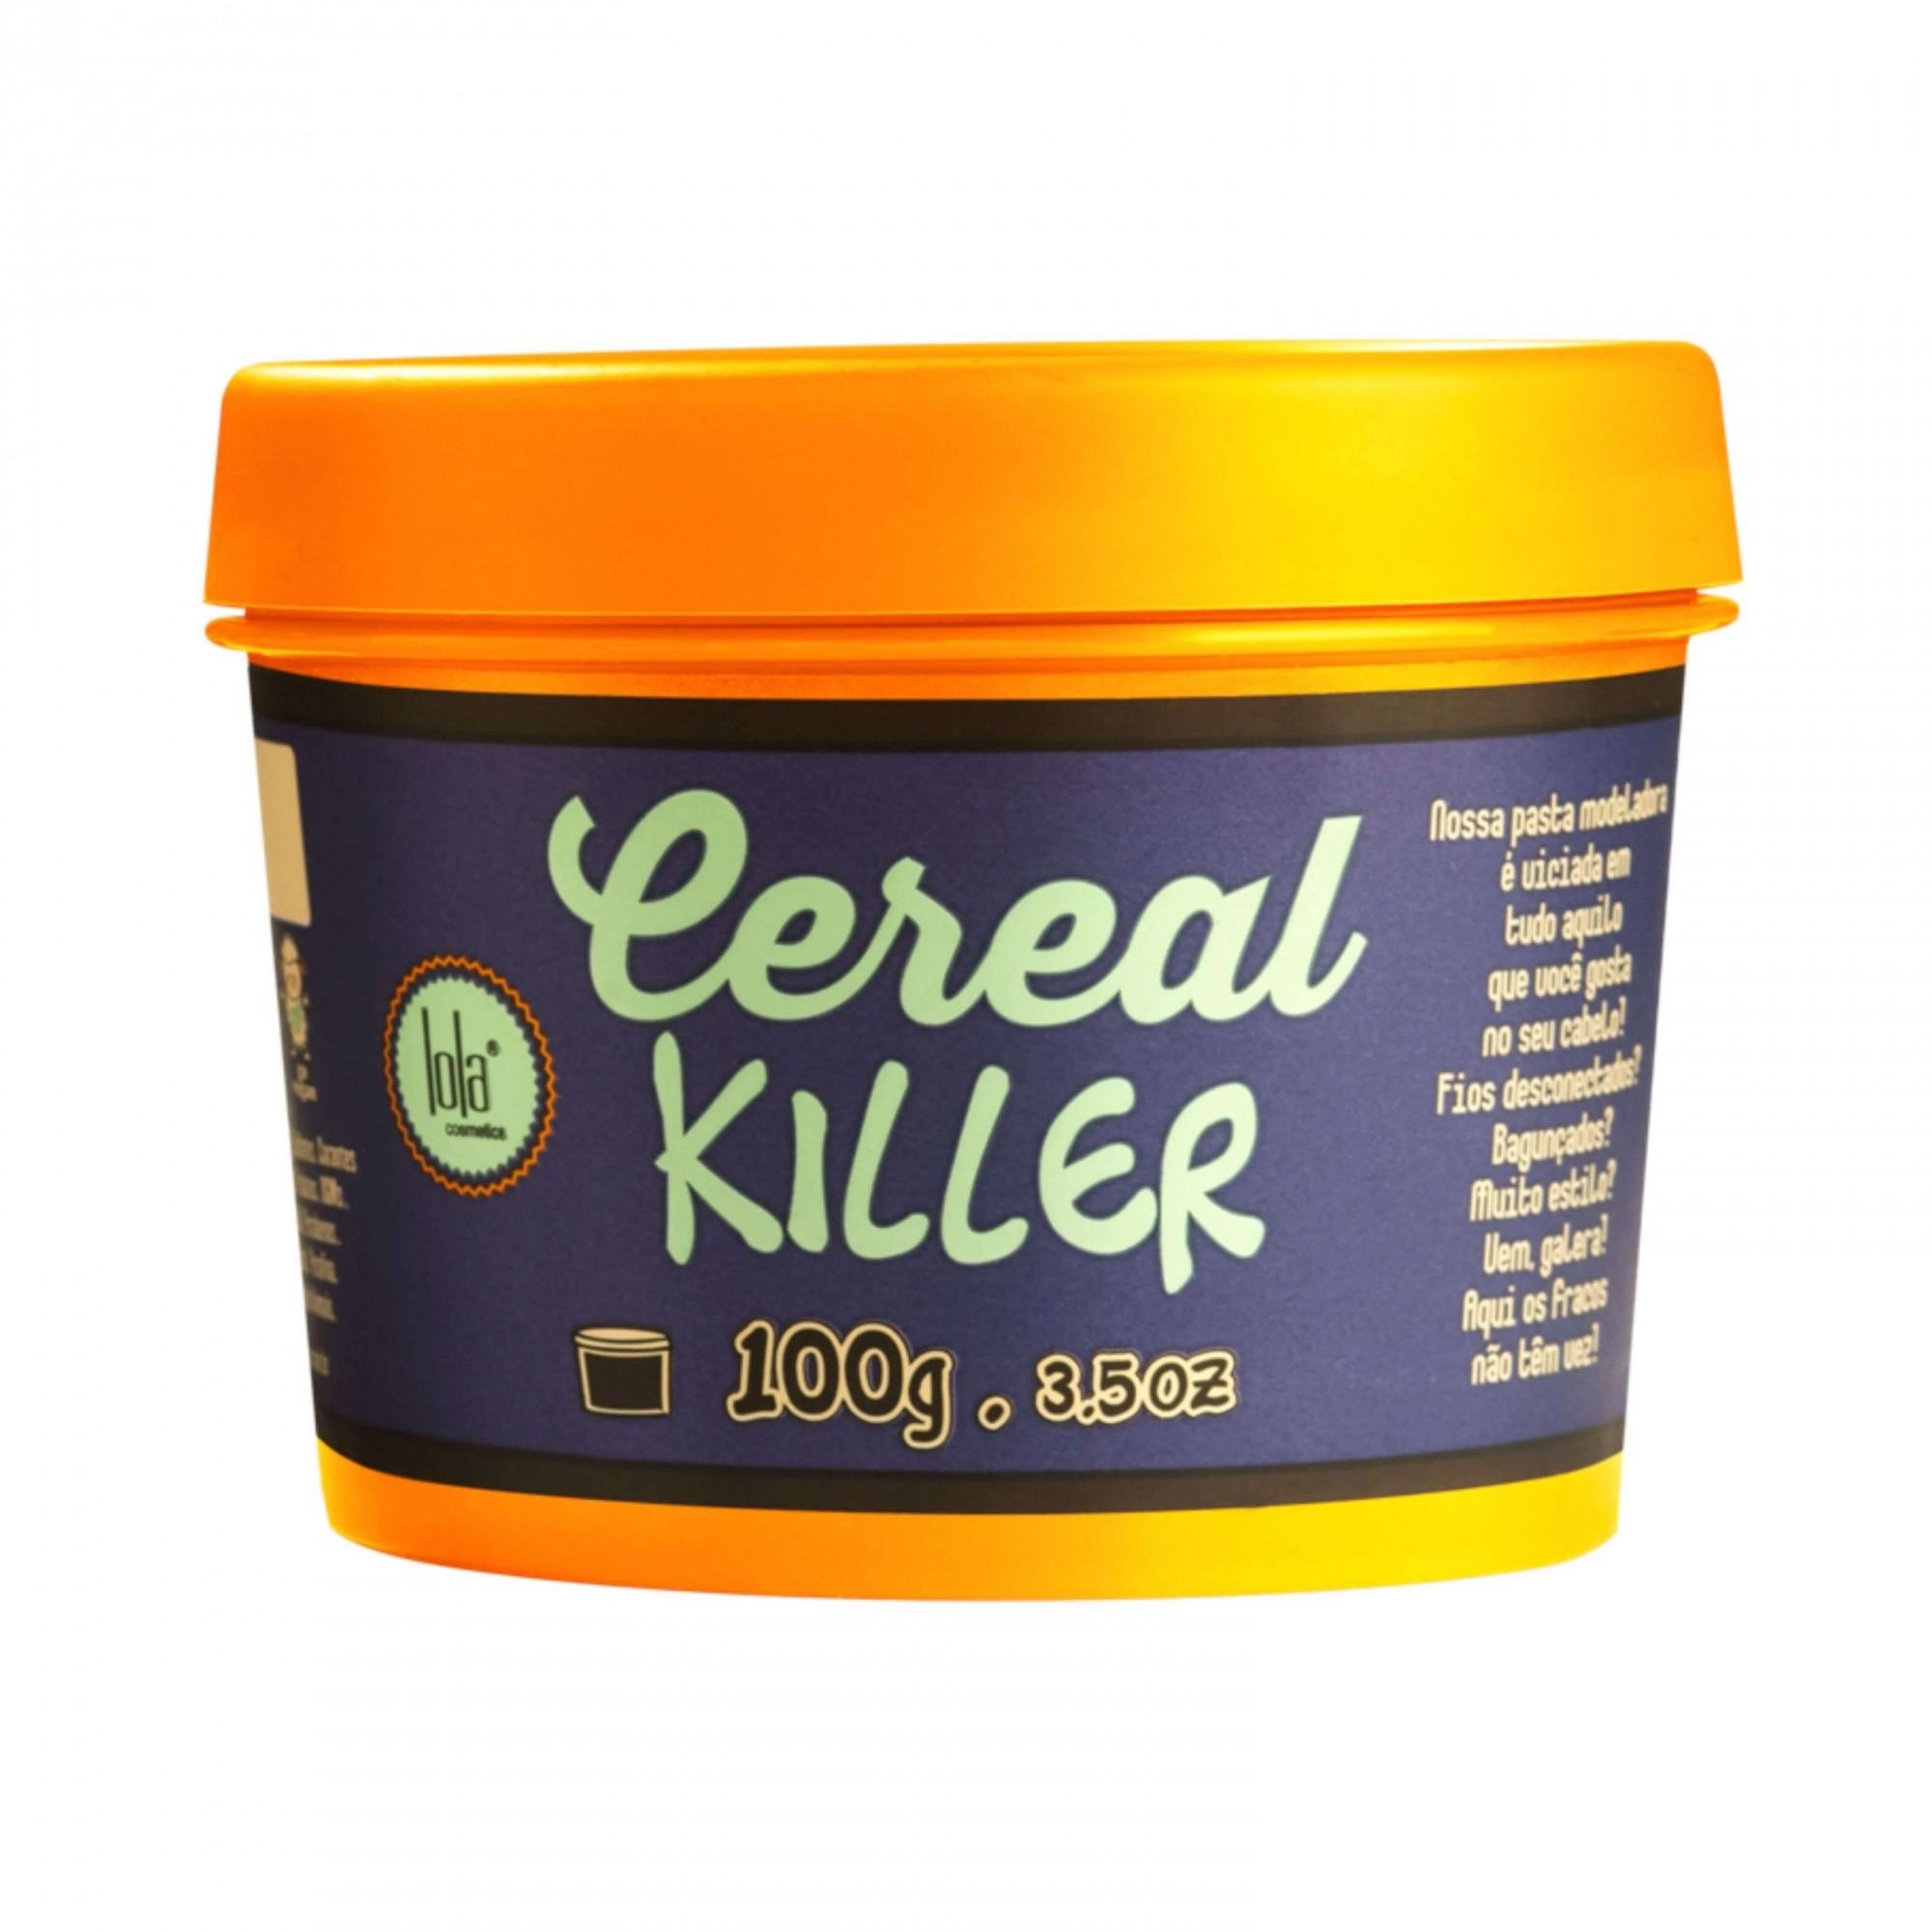 Lola Cosmetics Cereal Killer - Pasta Modeladora 100g